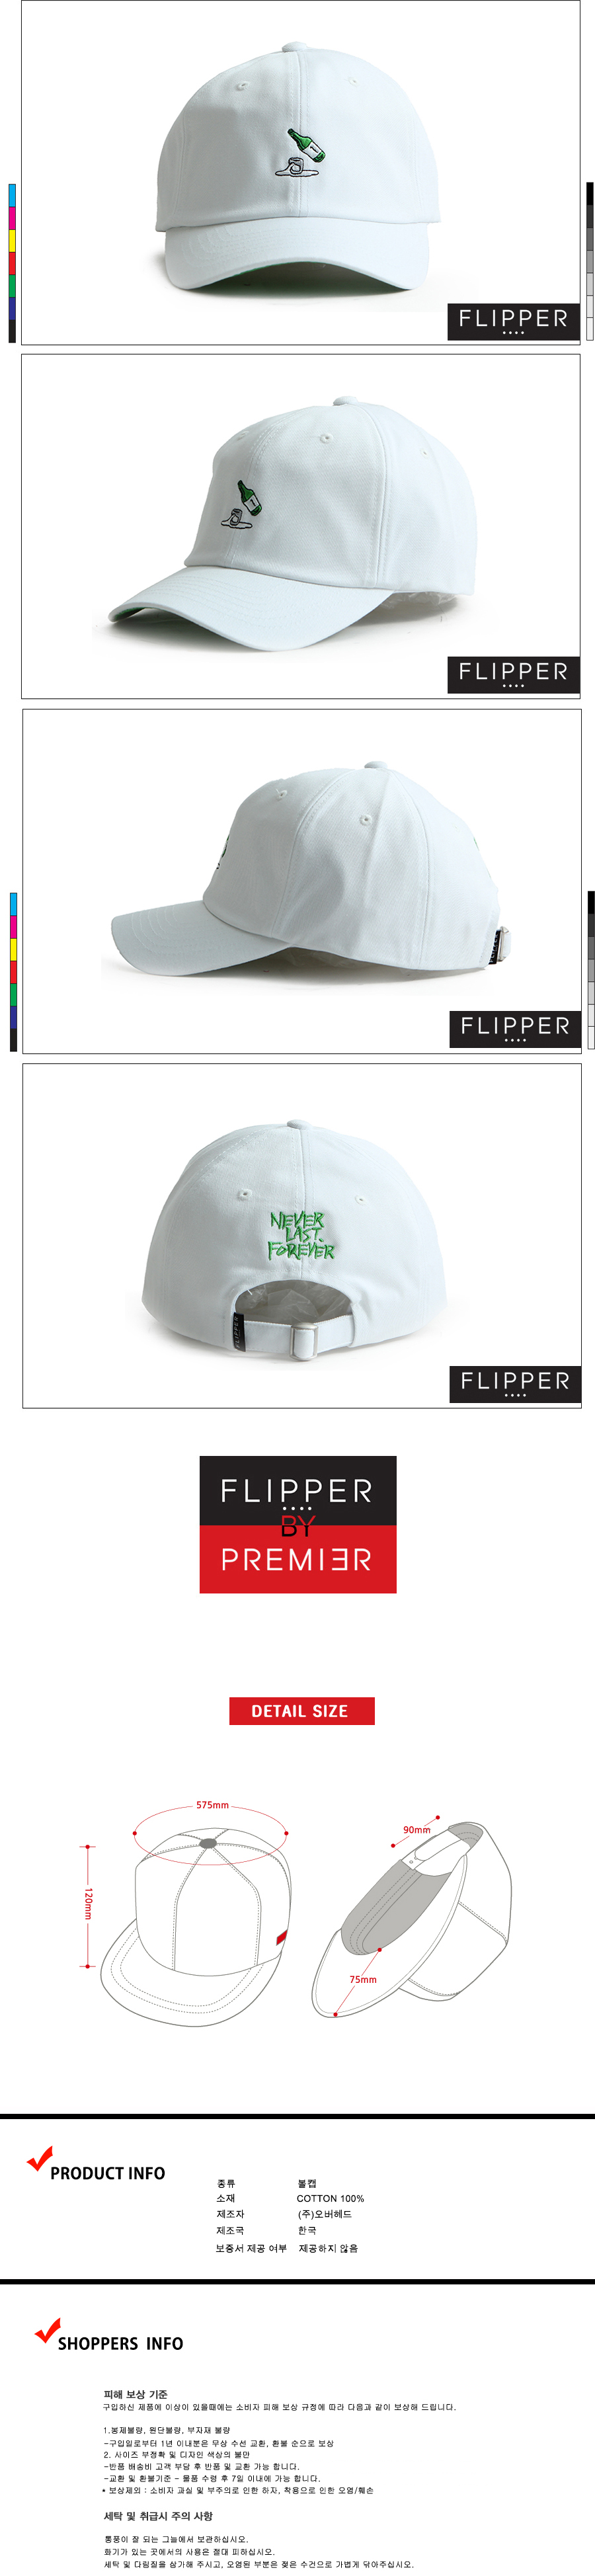 [ PREMIER ] [卓越]翻转球帽永远永远的白色(FL110)